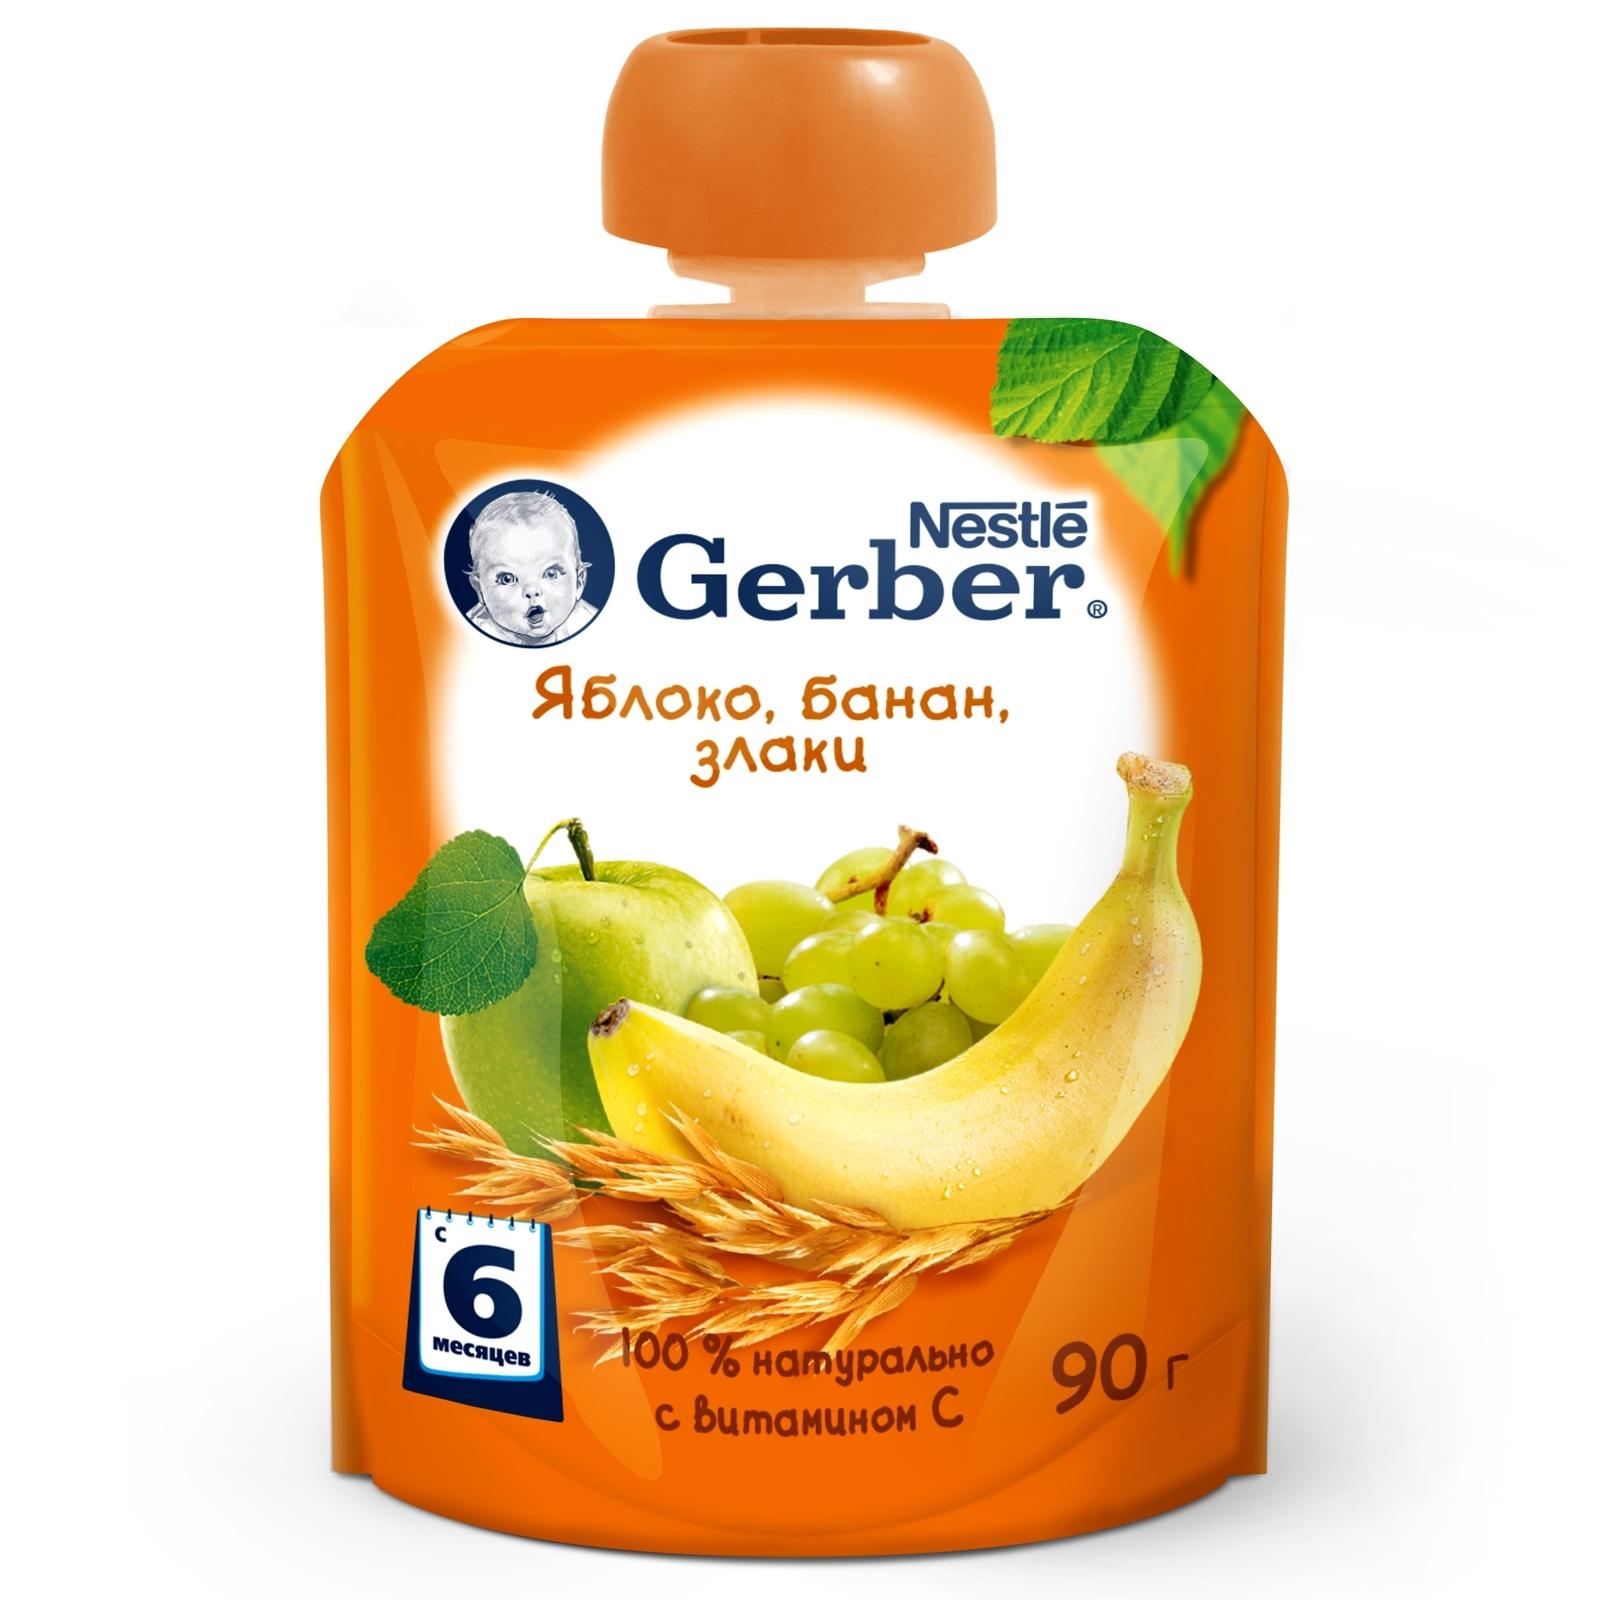 ���� Gerber ��������� 90 �� ������ ����� ����� (� 6 ���)